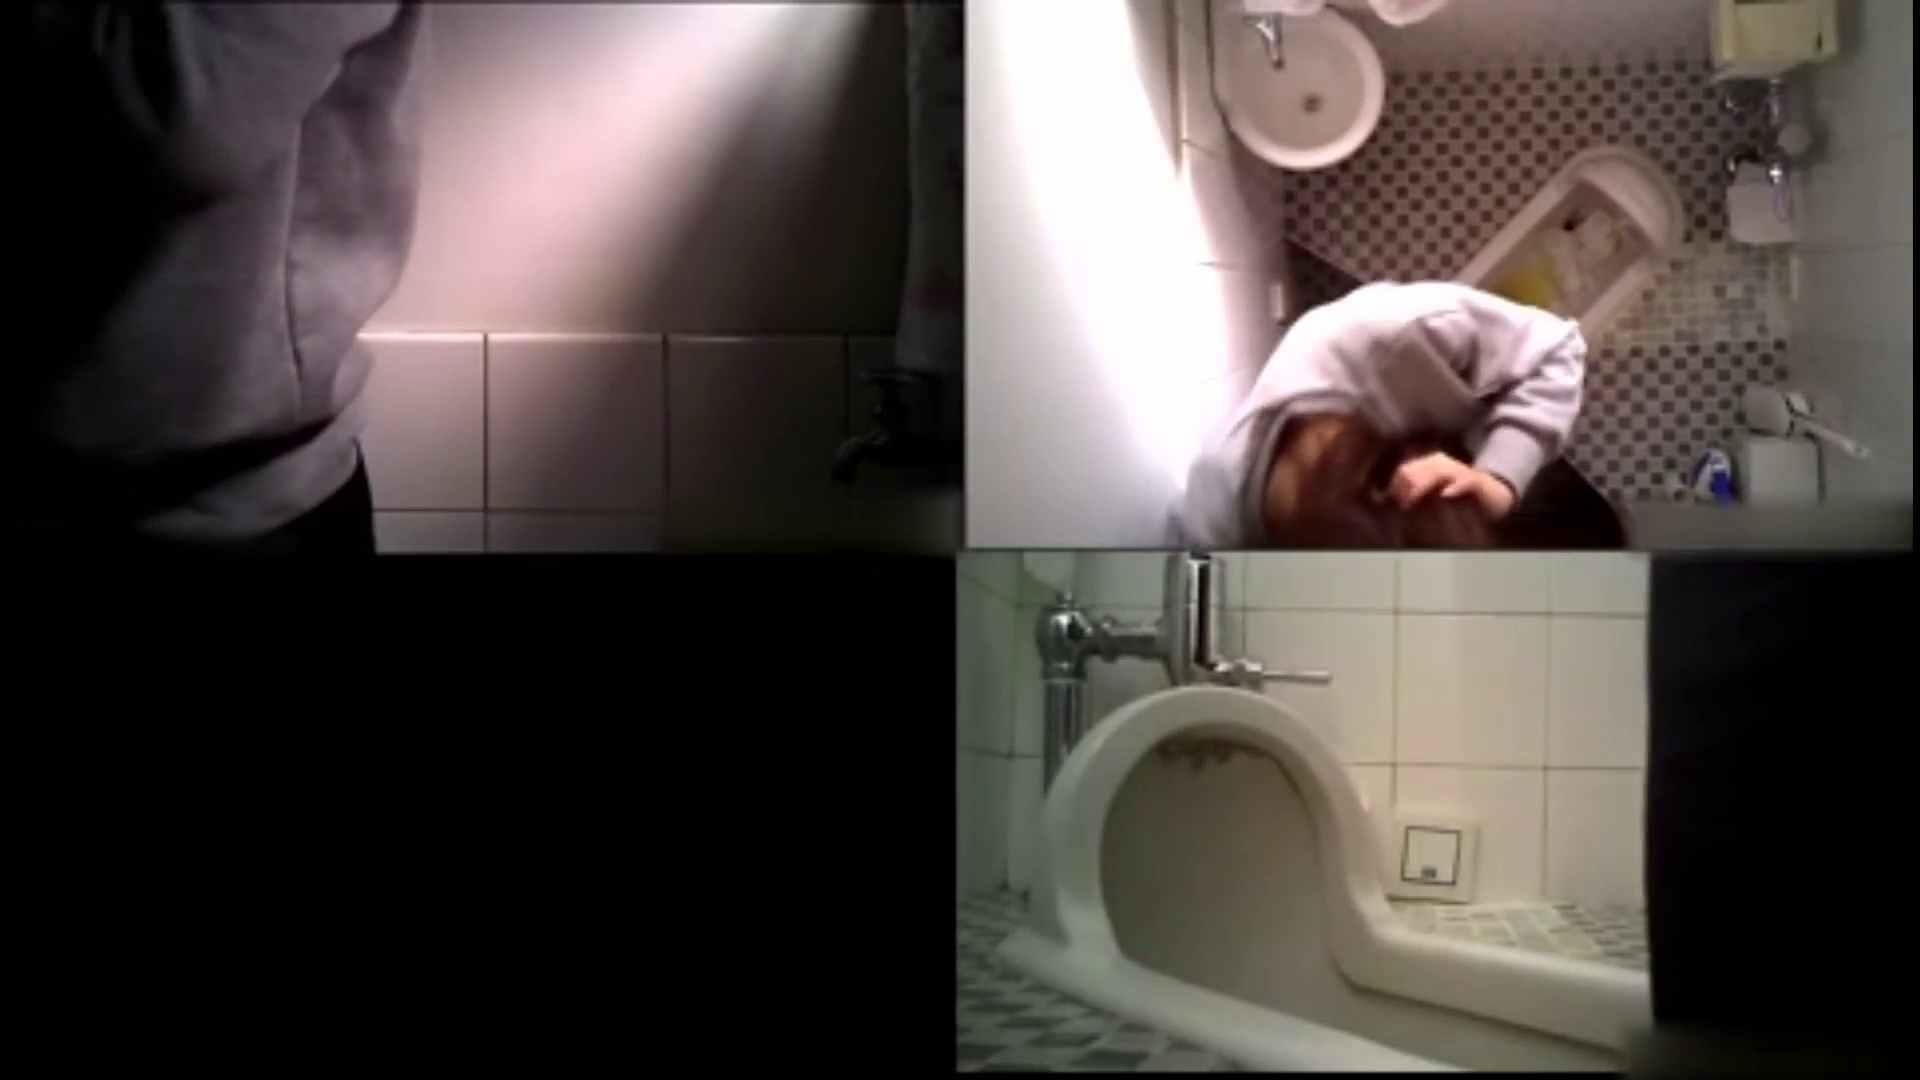 Vol.05 花の女子大生 トイレ恥態 進化系マルチアングル!! 女子大生 濡れ場動画紹介 66画像 38